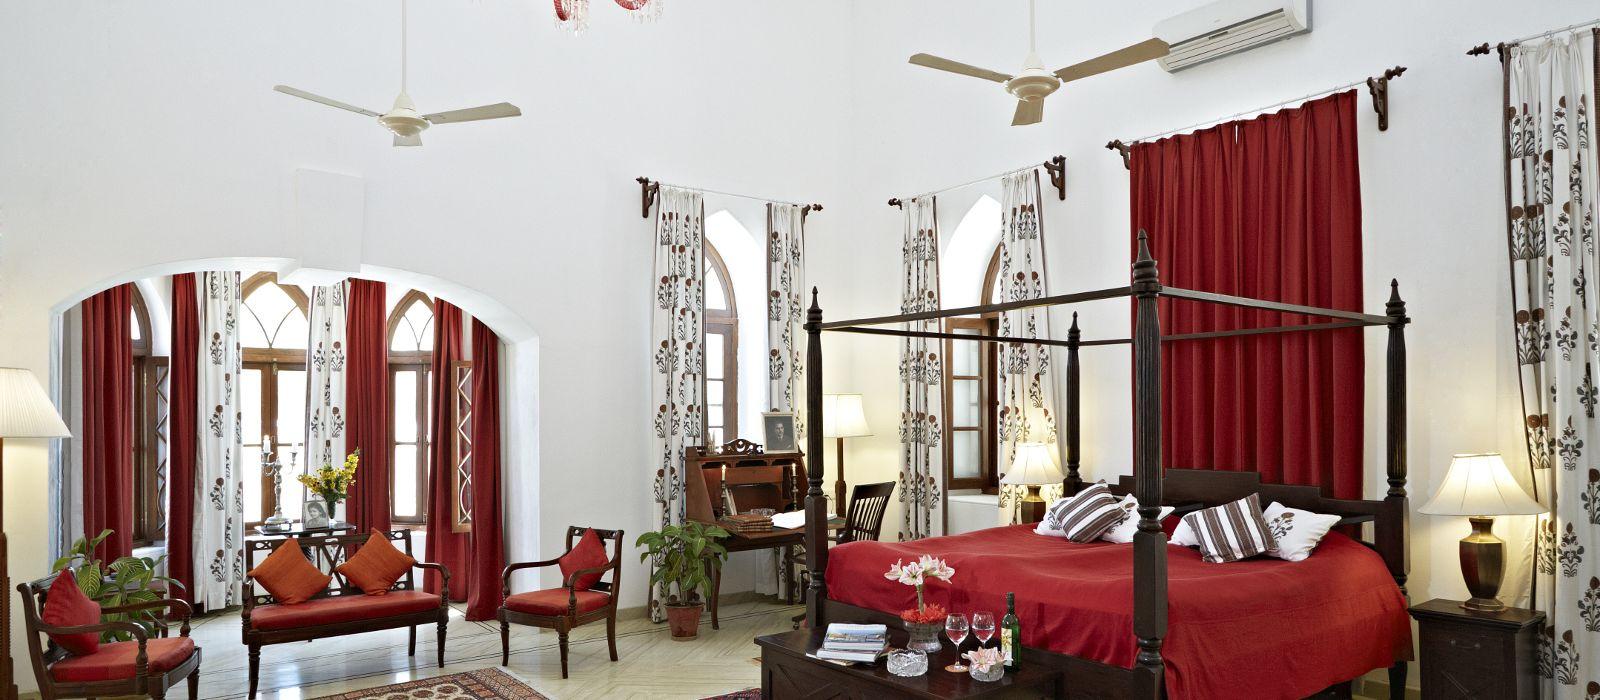 Hotel Shahpura Bagh Nordindien